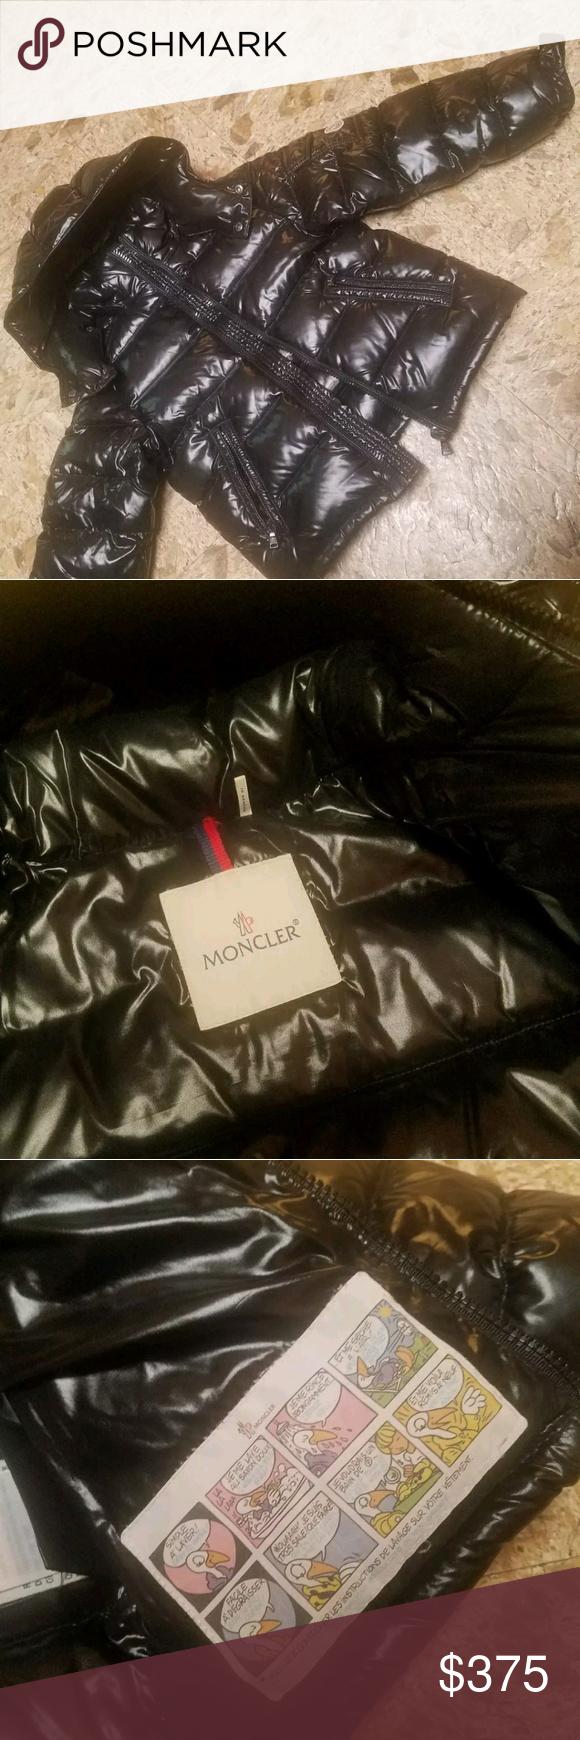 moncler jacket size 6